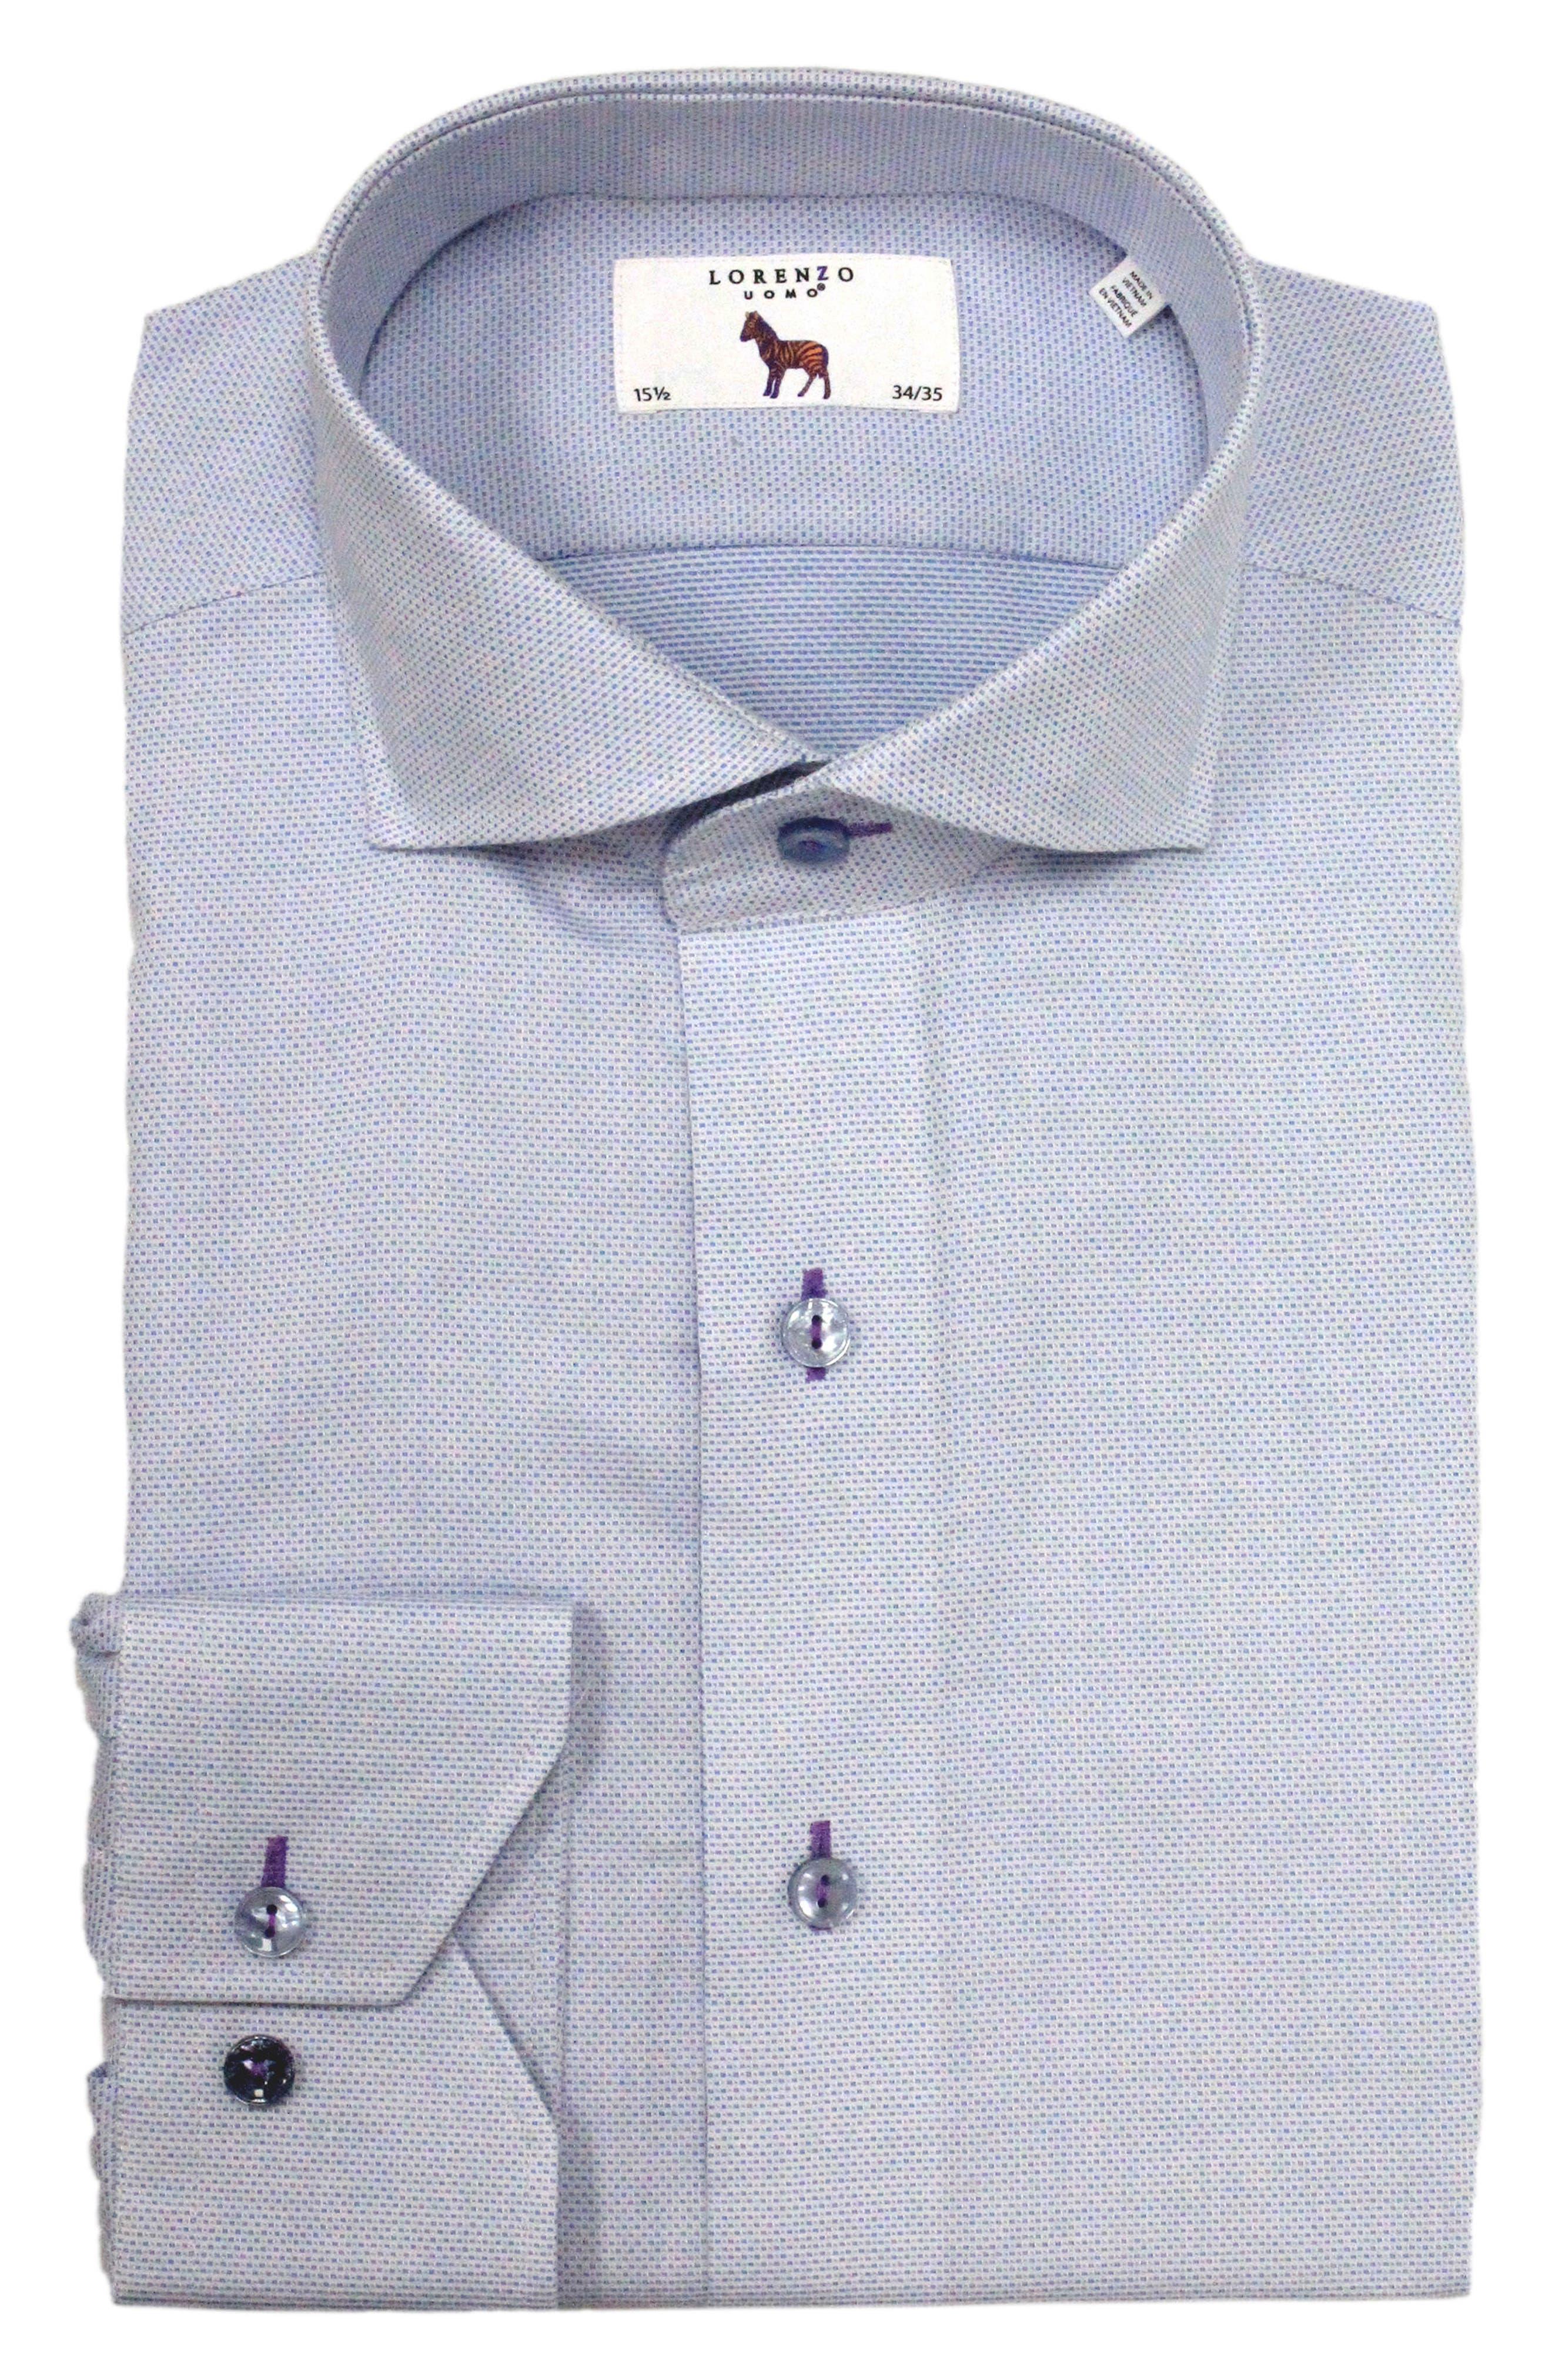 Alternate Image 1 Selected - Lorenzo Uomo Trim Fit Solid Dress Shirt